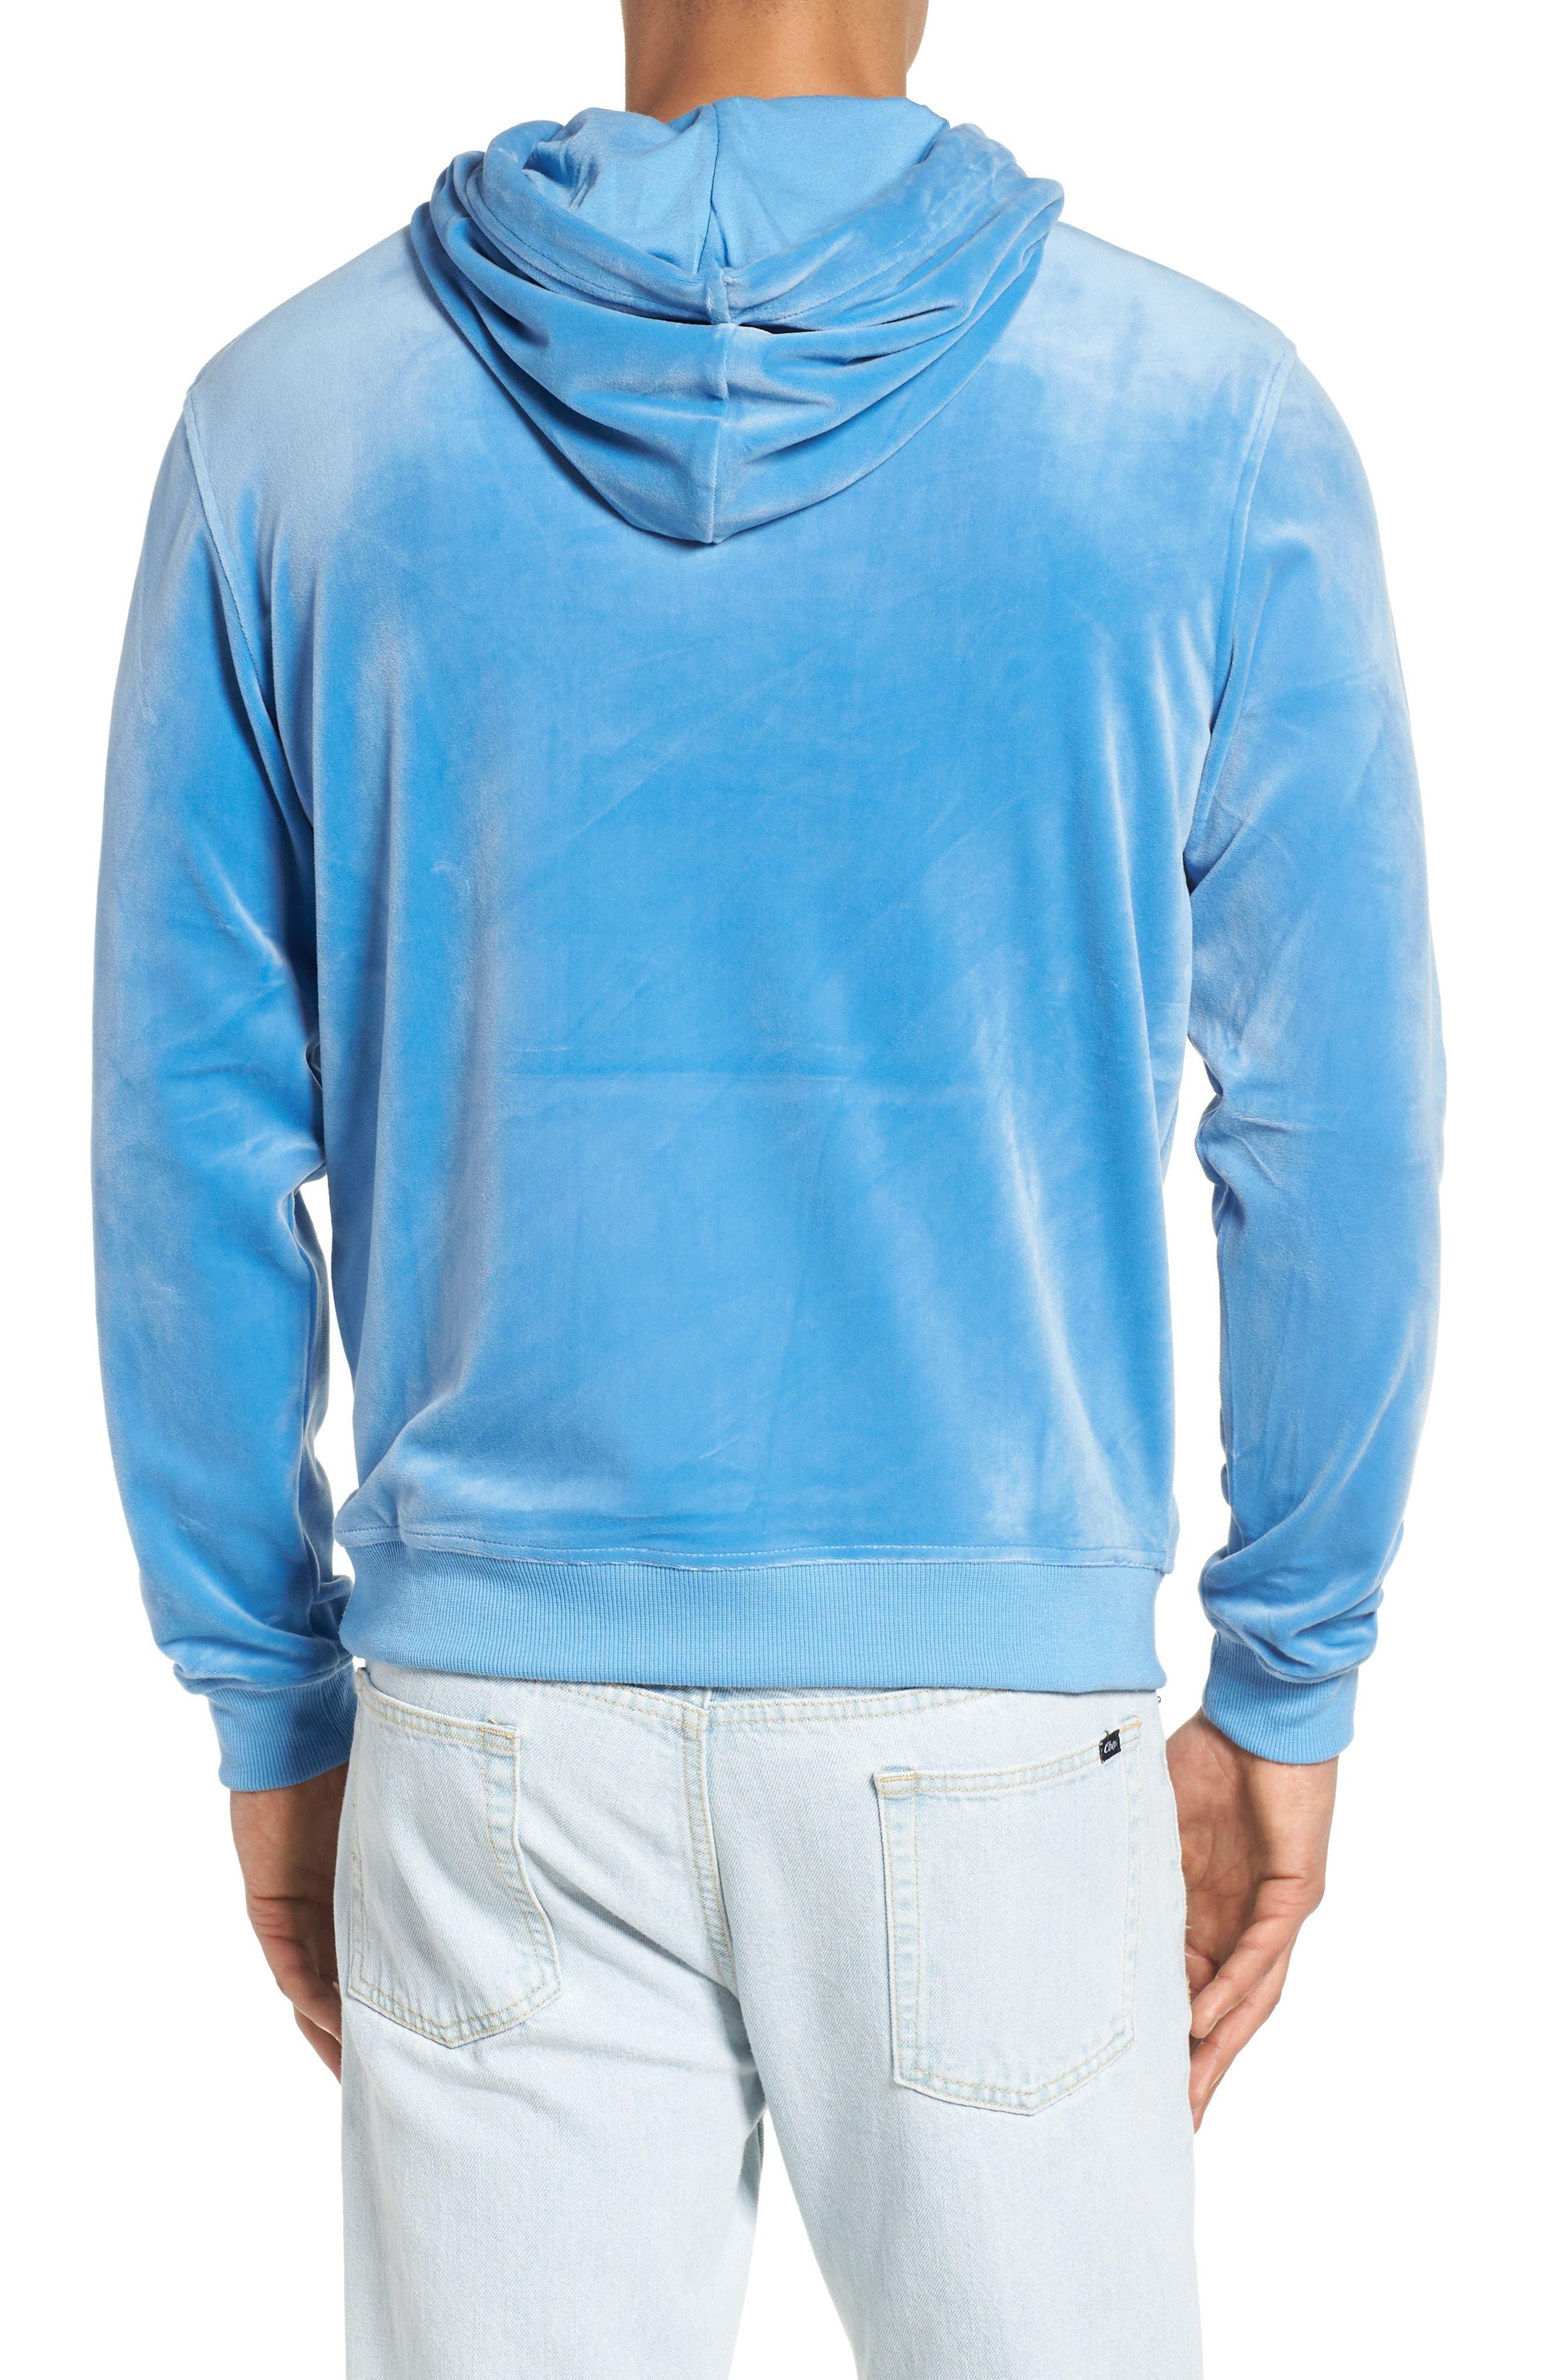 Asher Velour Hoodie Sweatshirt,                             Alternate thumbnail 2, color,                             Silver Lake Blue